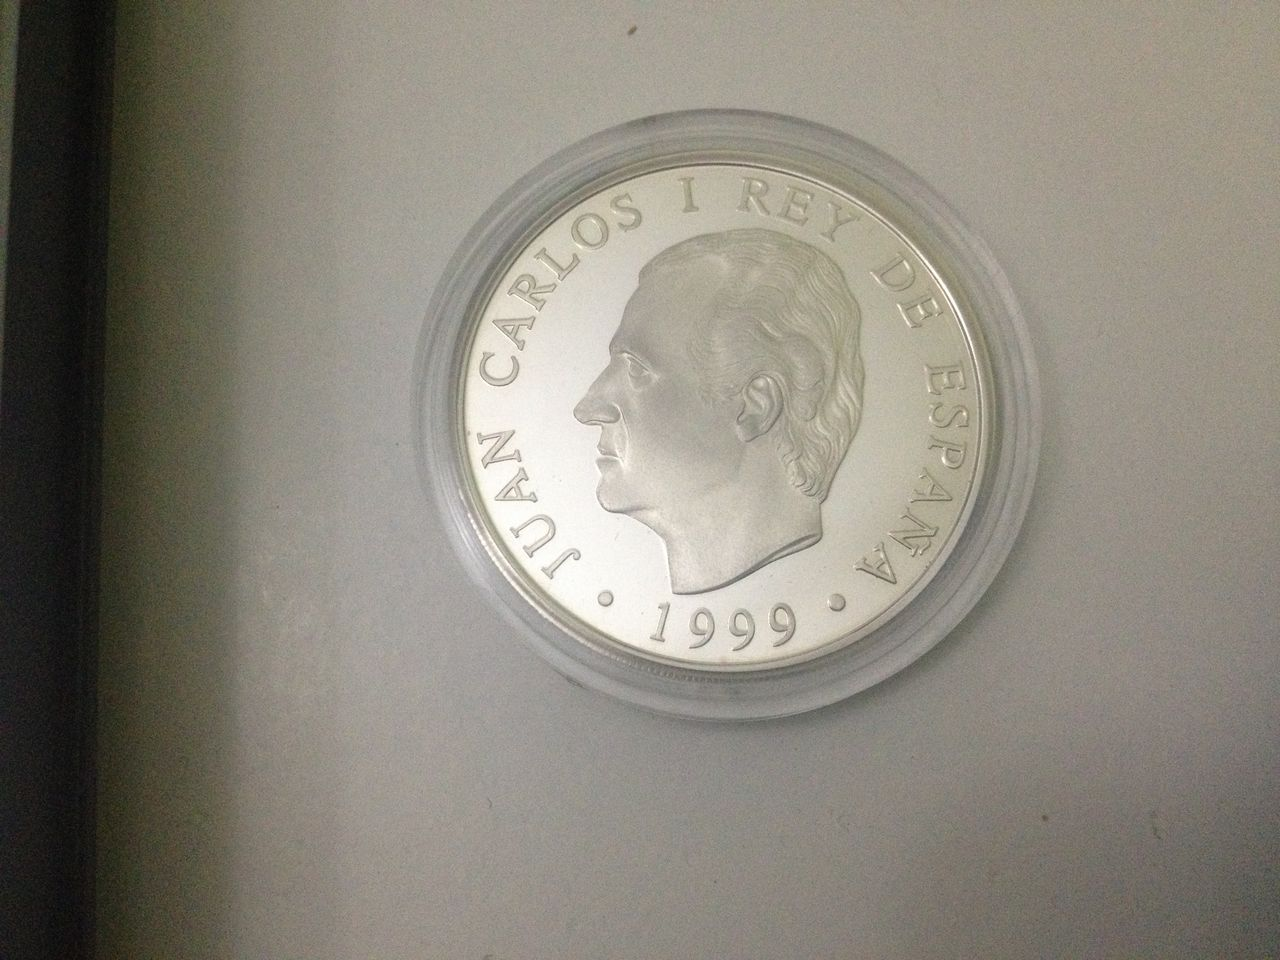 "2000 Pesetas 1999 Juan carlos I, Conmemorativa ""750 Anys de Govern Municipal"" IMG_2211"